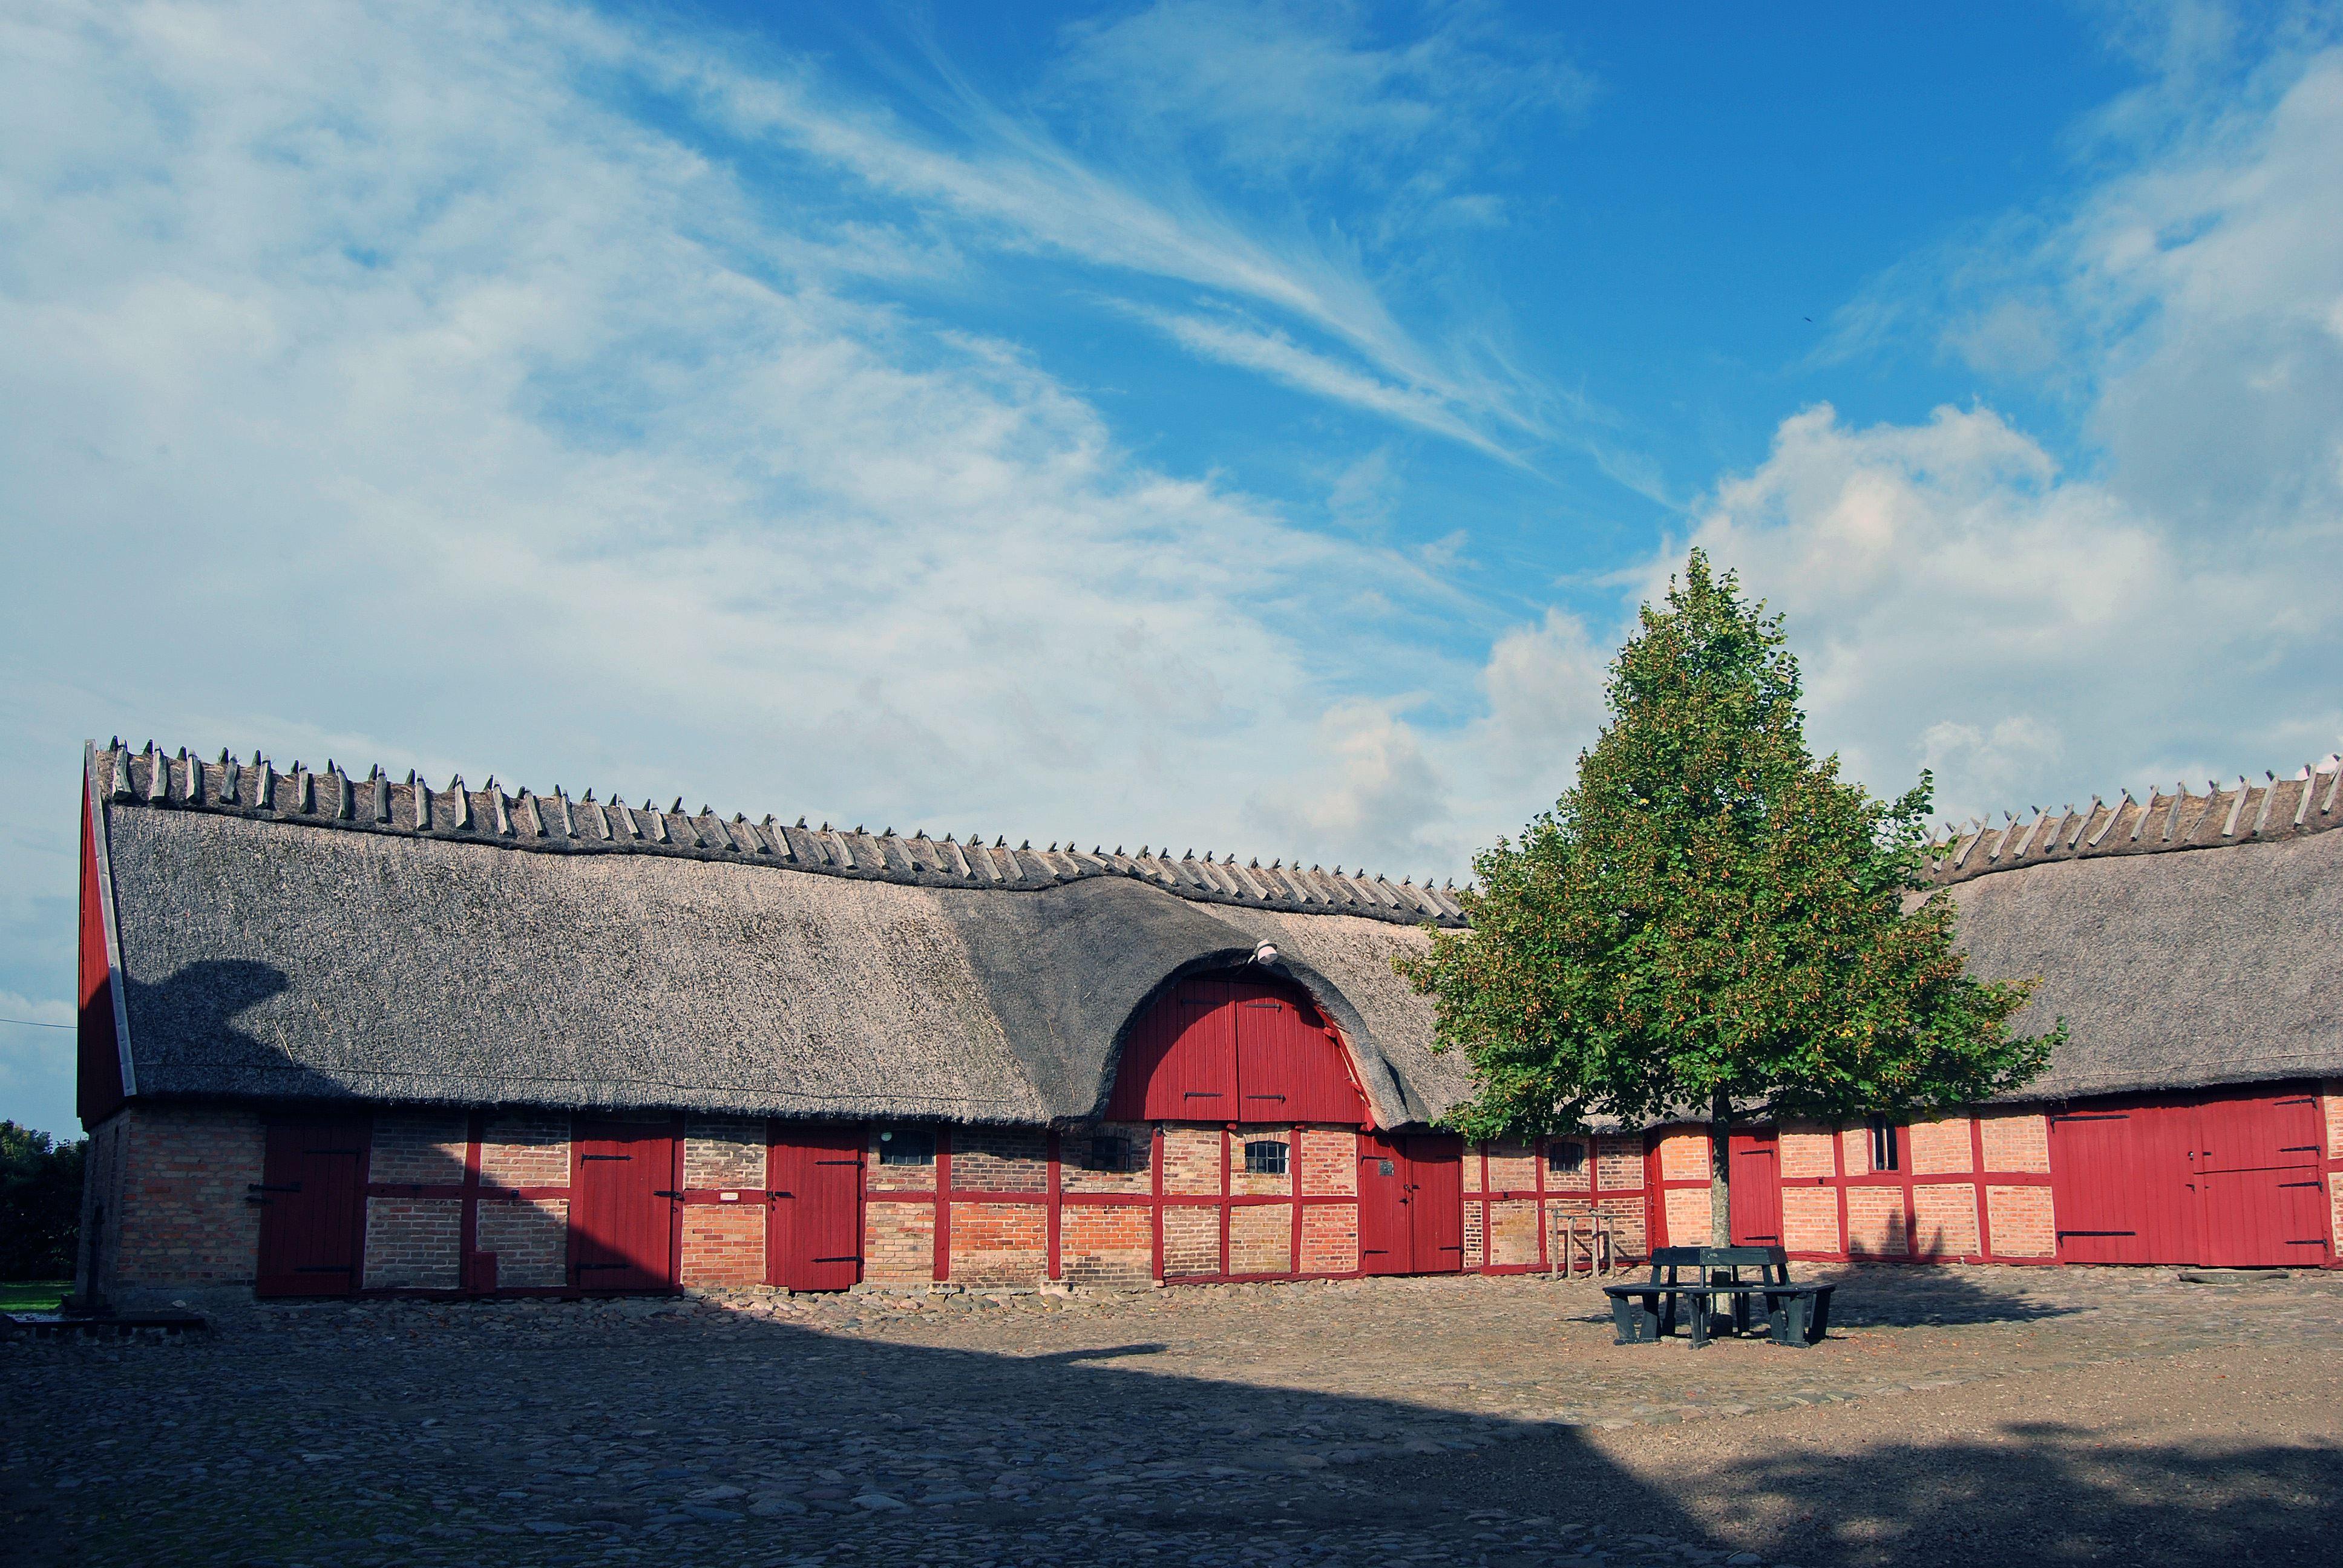 Asmundtorp's local heritage museum